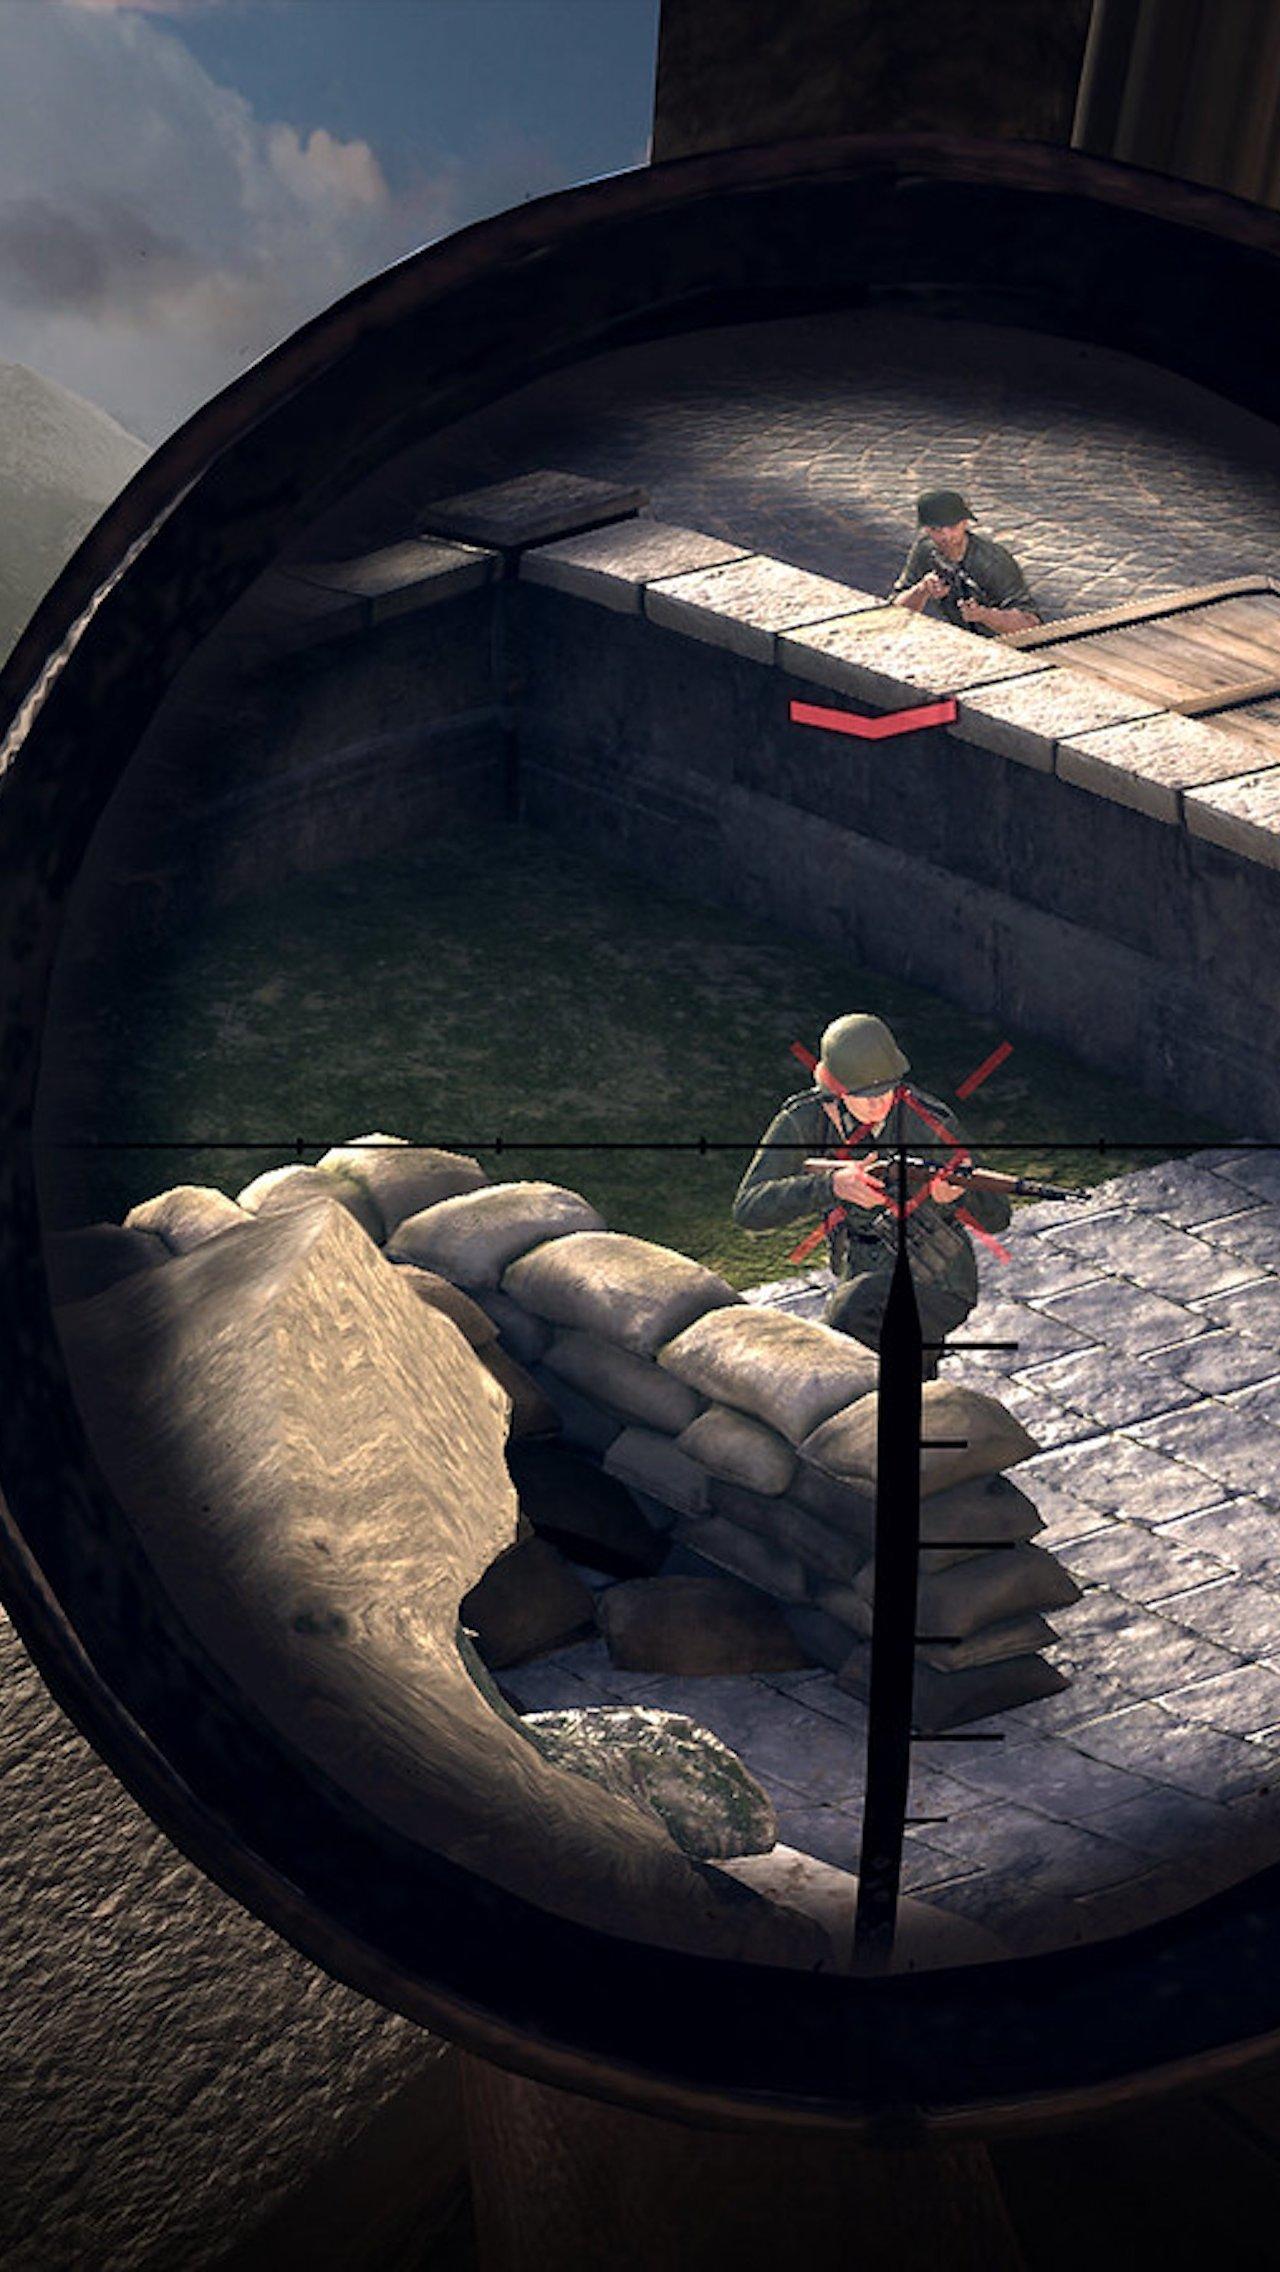 Sniper Elite VR (шутер): ПК, PS4 — 8 июля